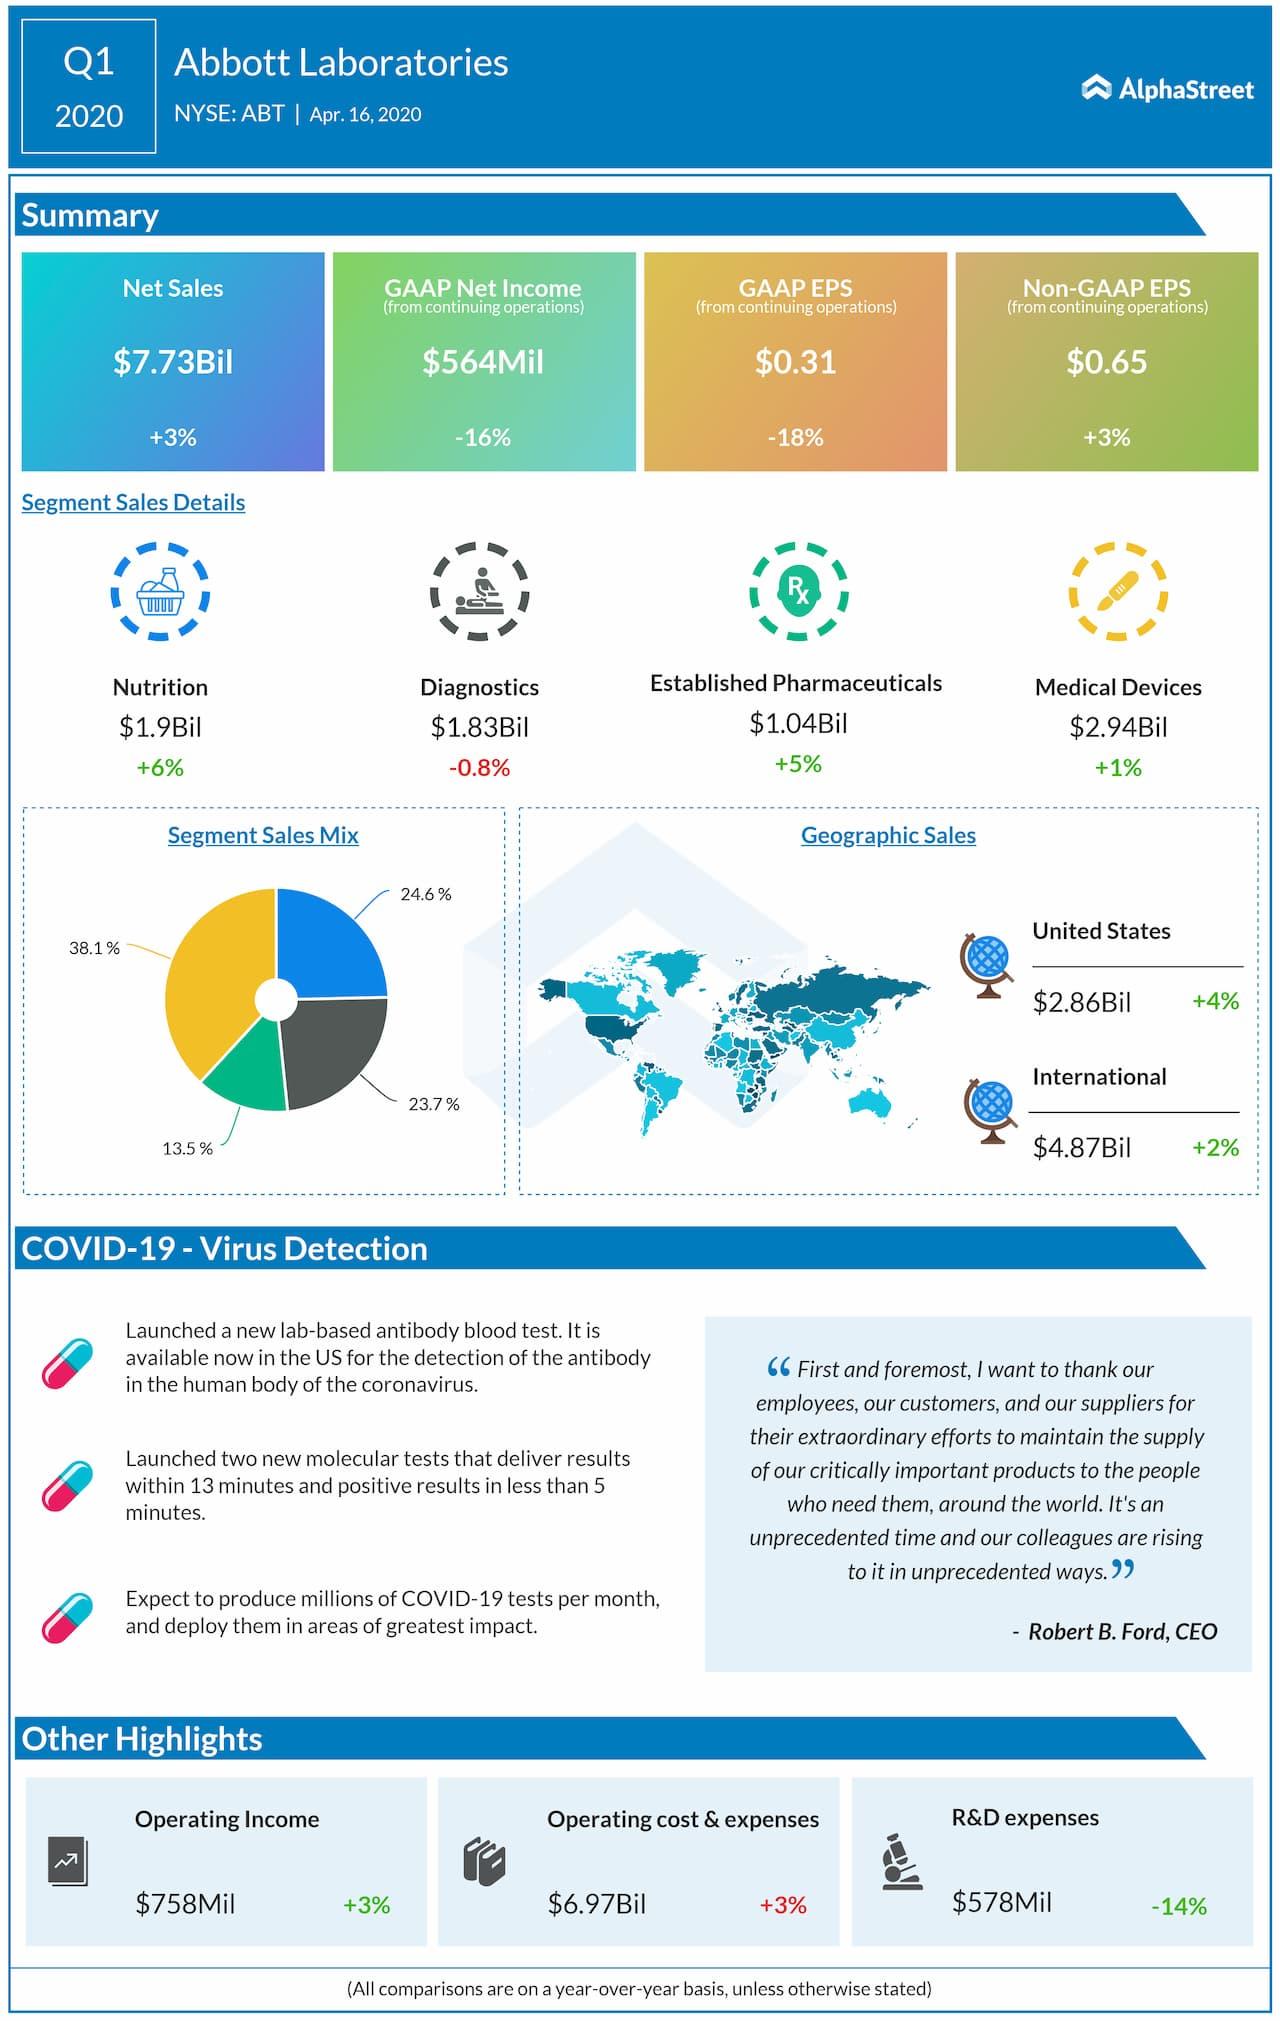 Abbott Laboratories (ABT) Q1 2020 earnings review